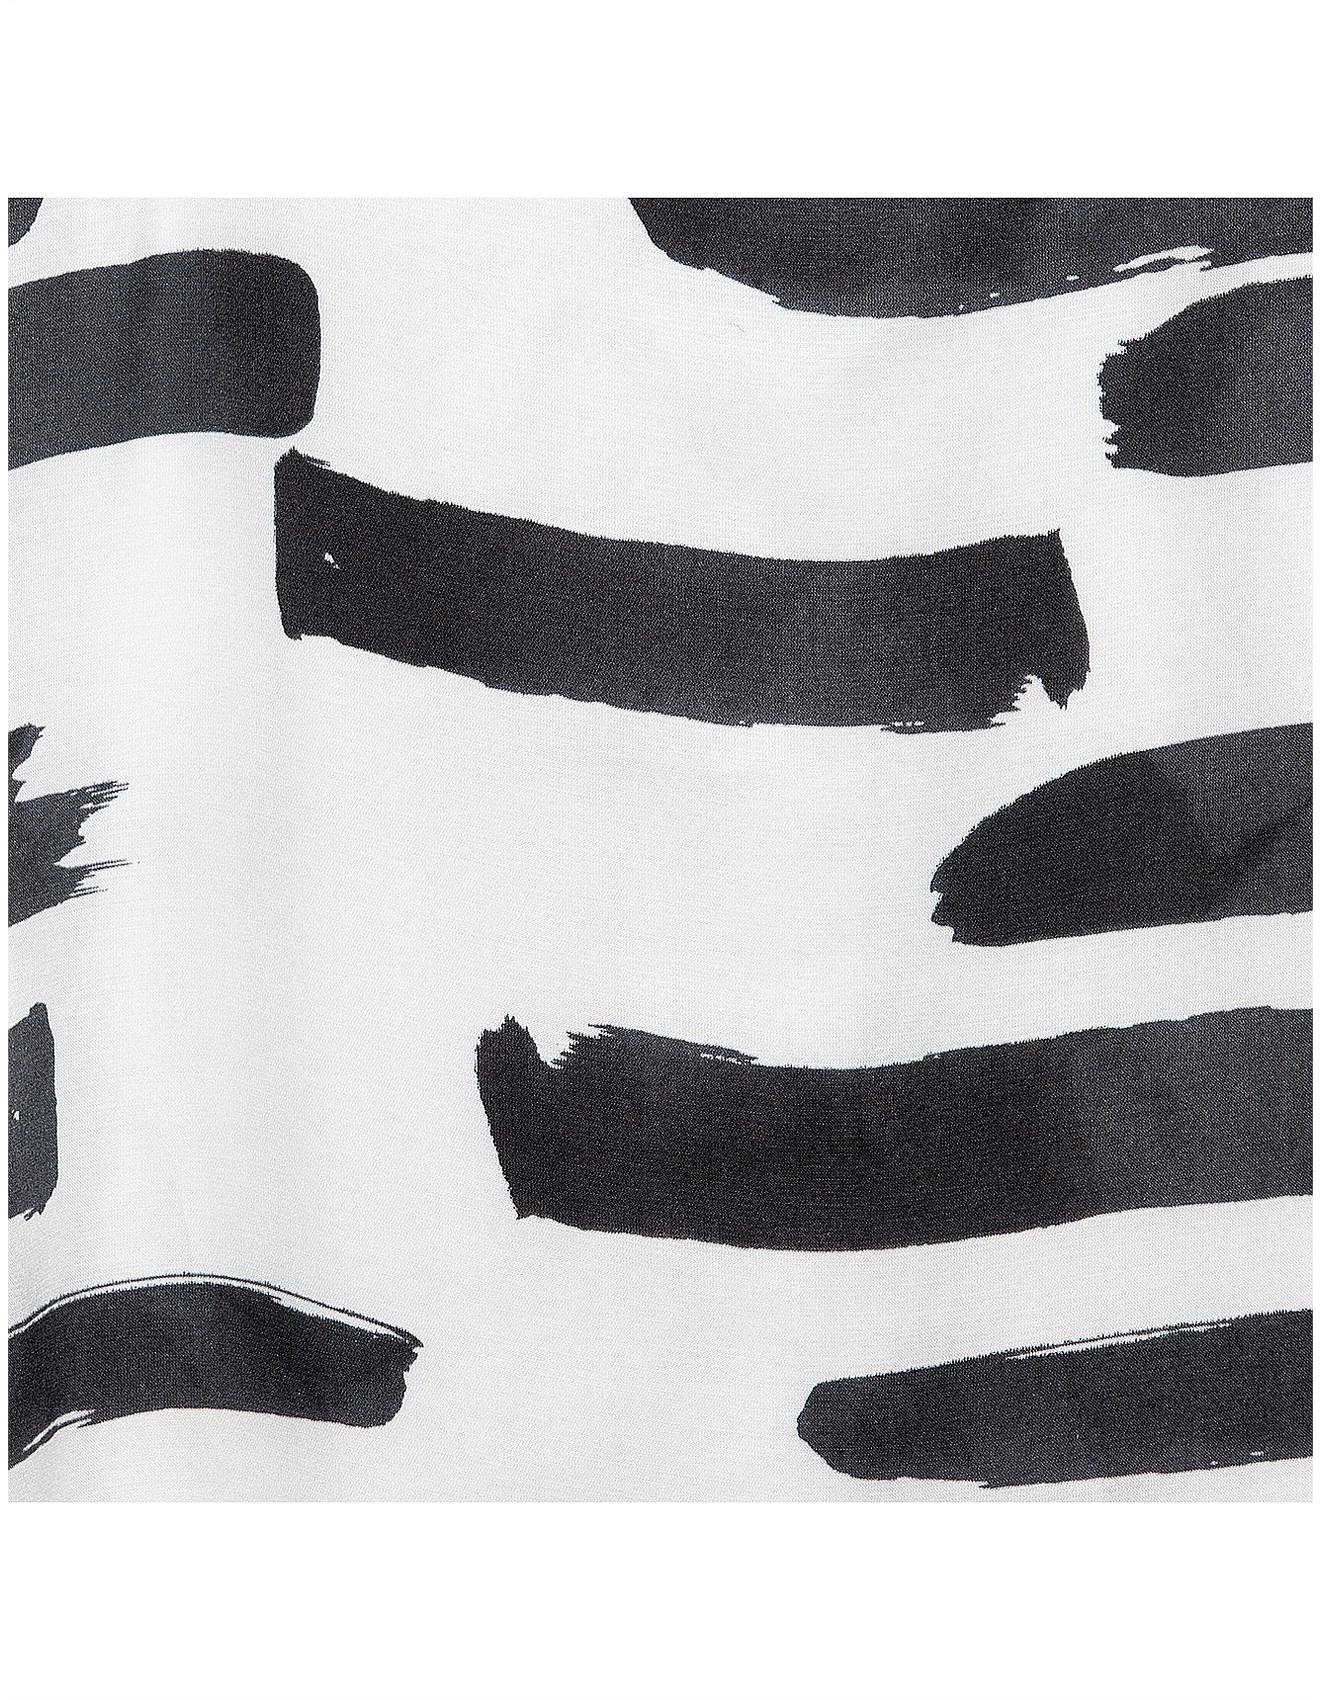 marco polo buy marco polo clothing online david jones. Black Bedroom Furniture Sets. Home Design Ideas